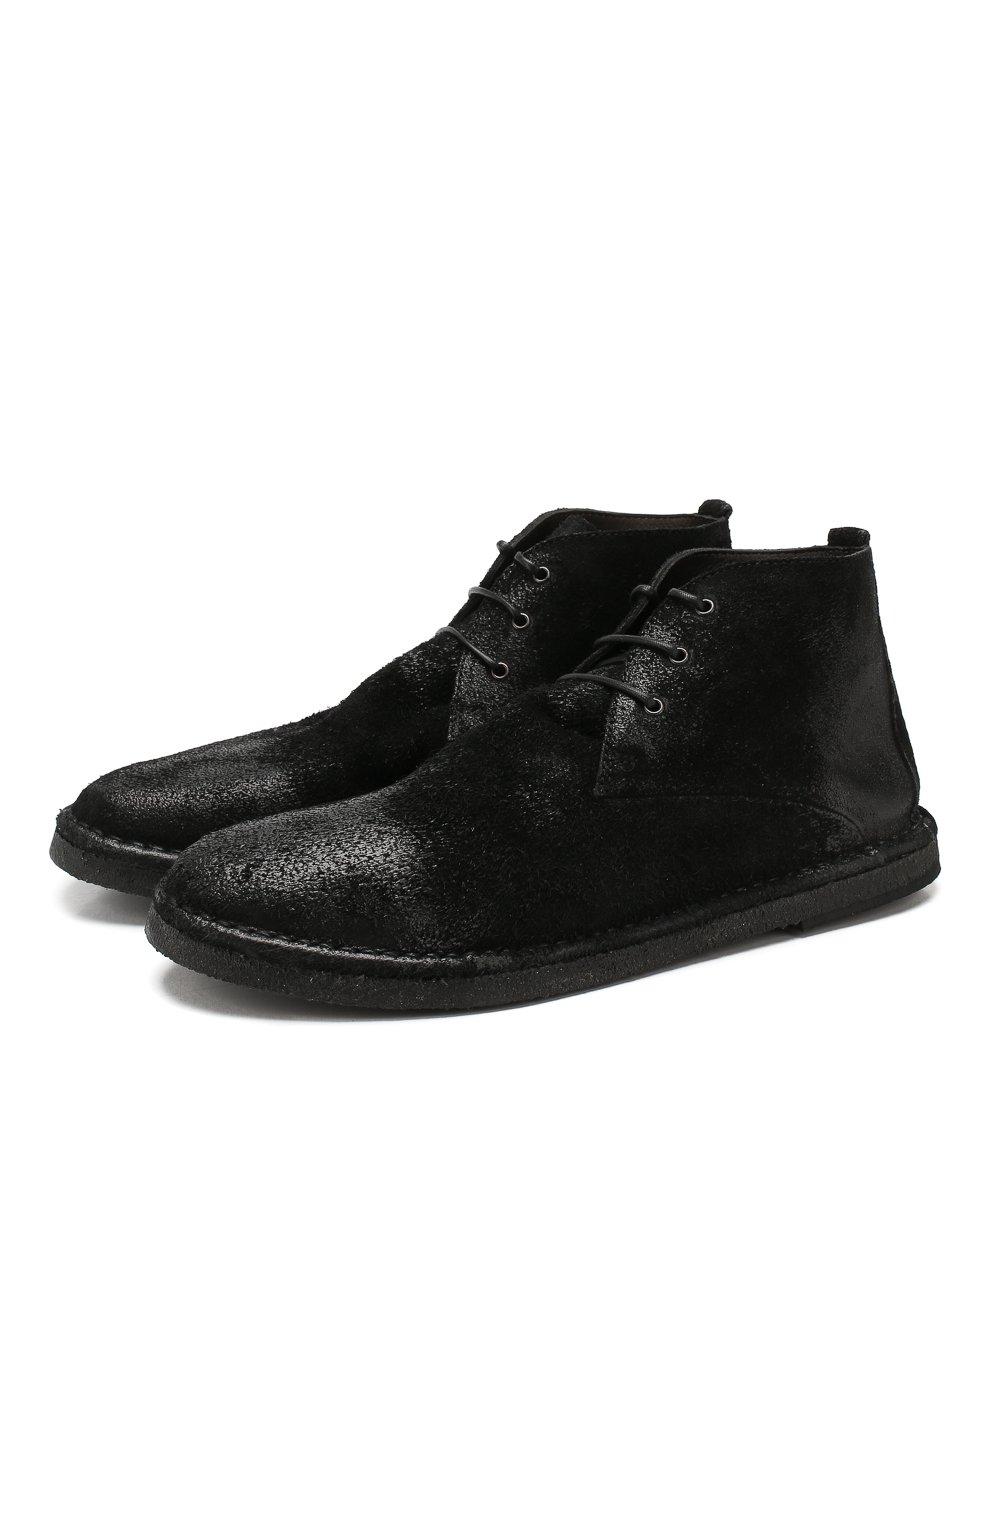 Мужские замшевые ботинки MARSELL черного цвета, арт. MM2795/SPALLA R0VESCI0 | Фото 1